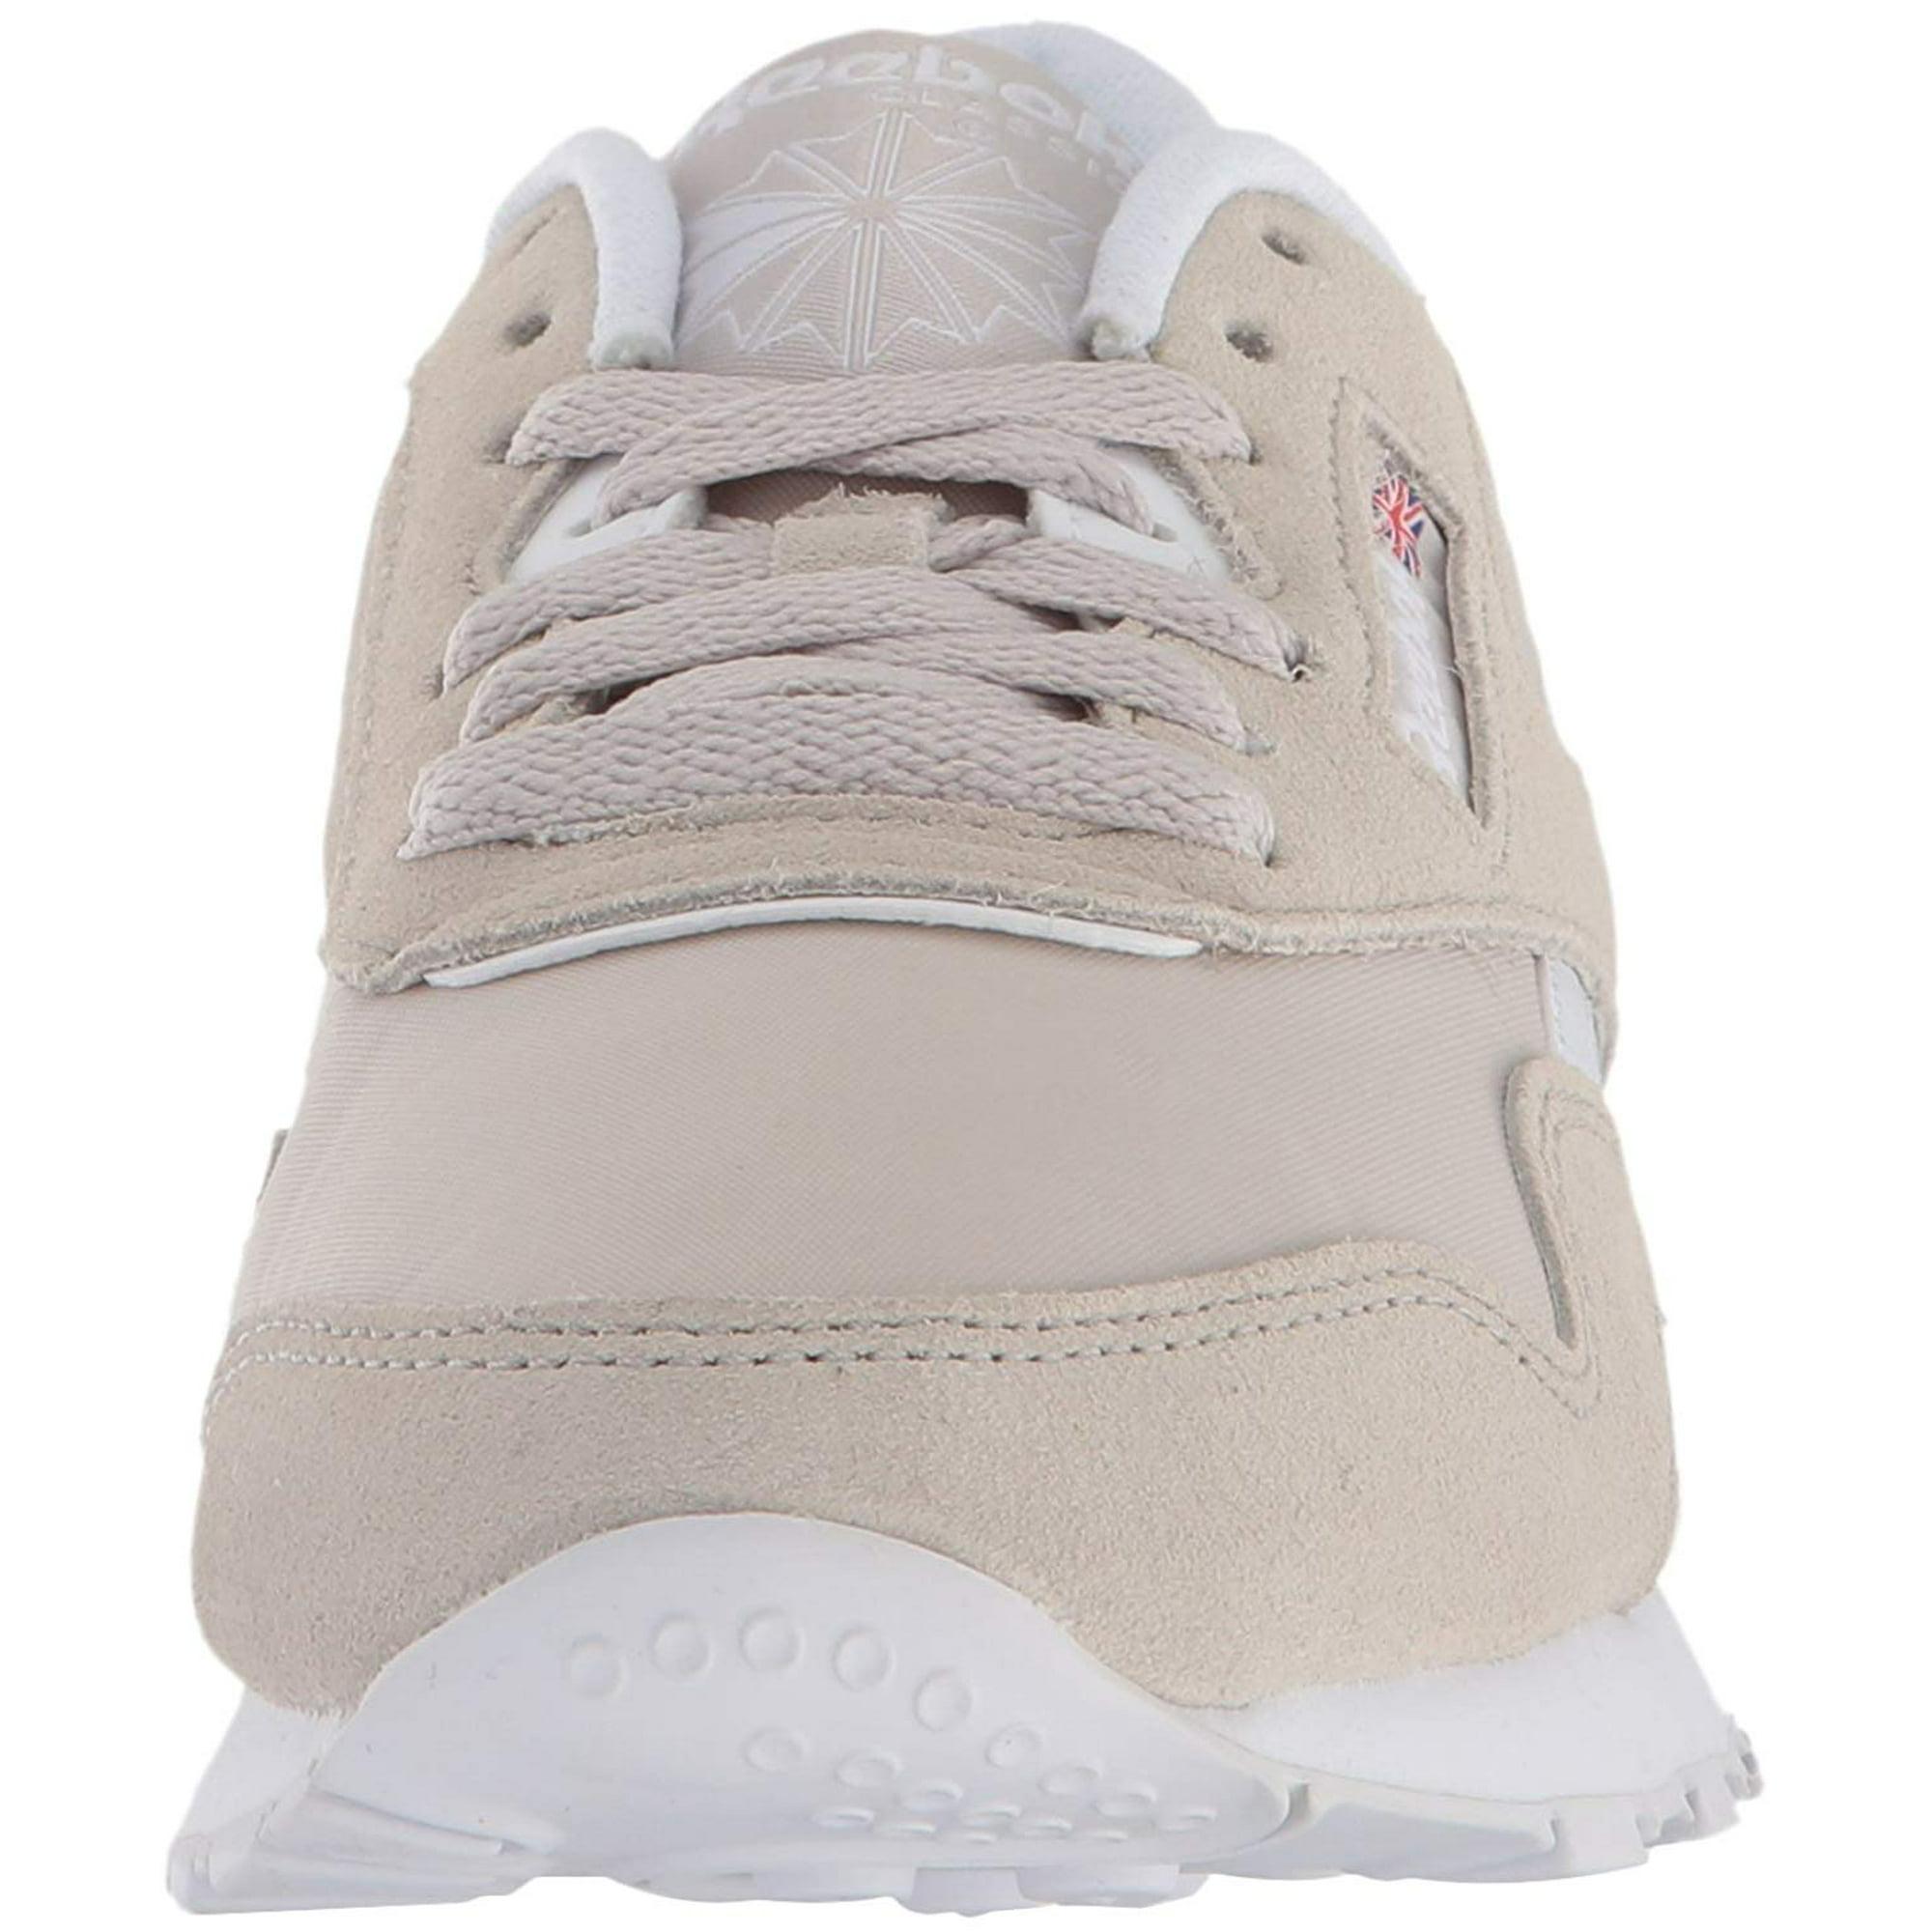 d831e75414ee5 Reebok Women s Cl Nylon Neutrals Sandstone   White Ankle-High Fashion  Sneaker - 8M